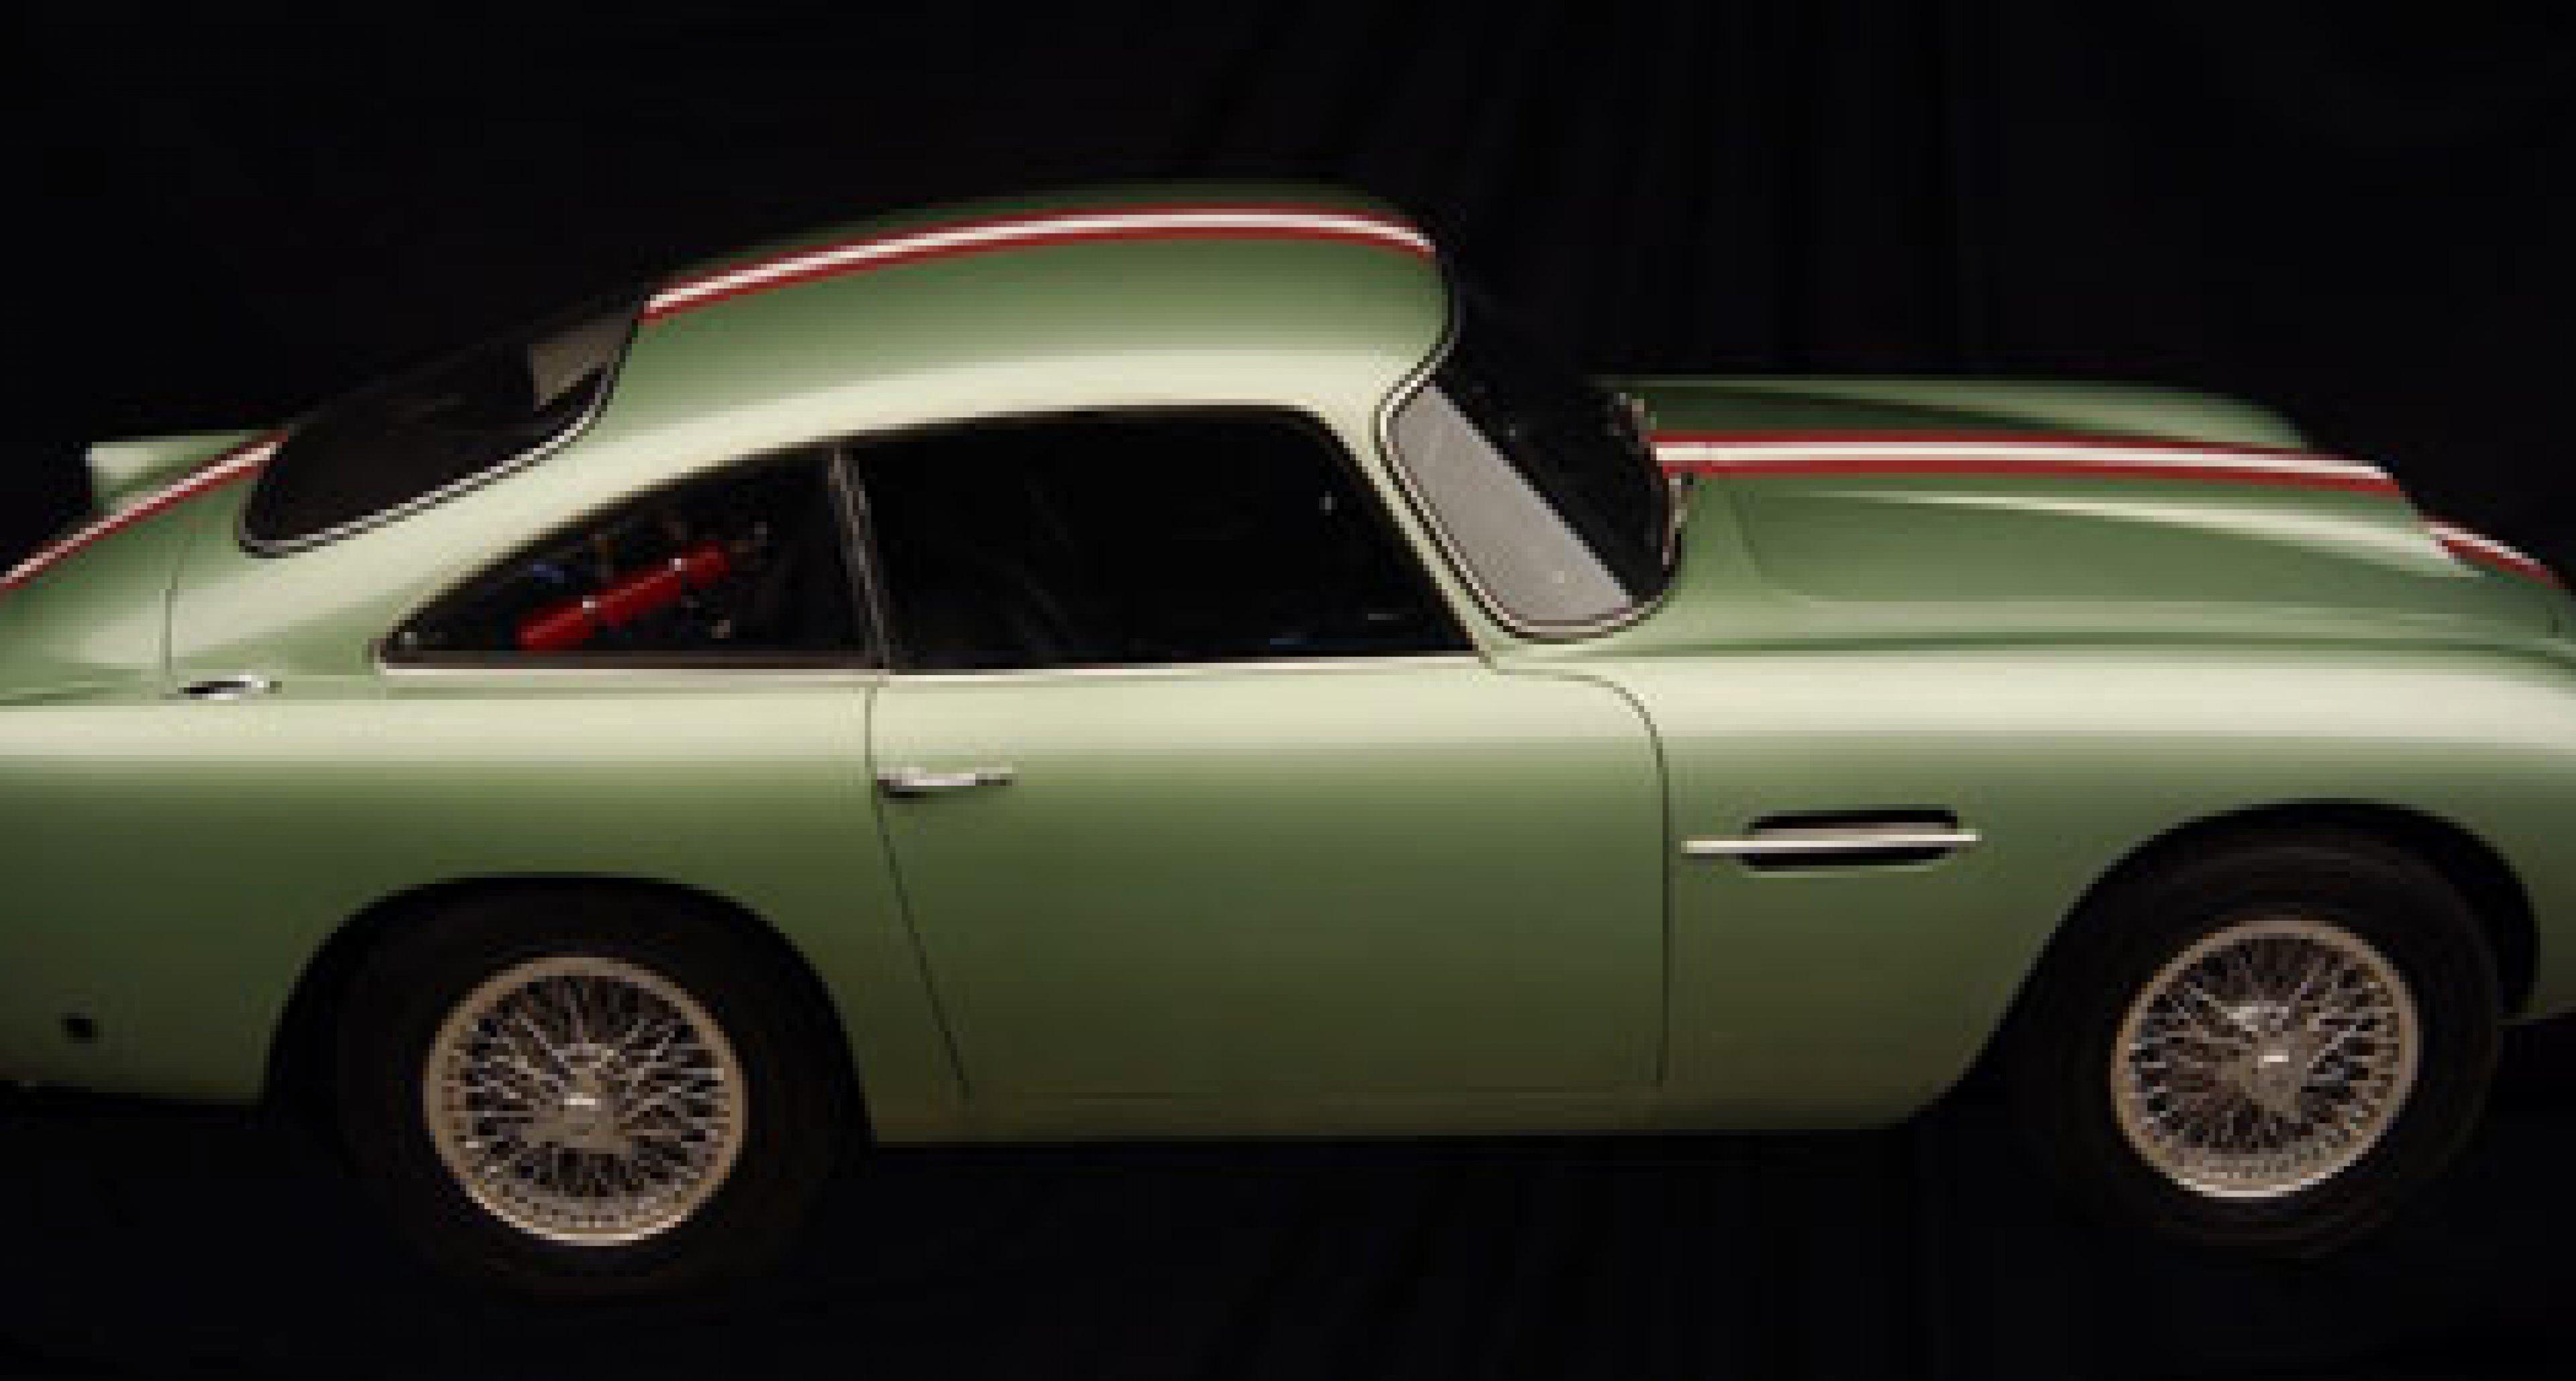 Bonhams Aston Martin Auktion 2003 - Vorschau